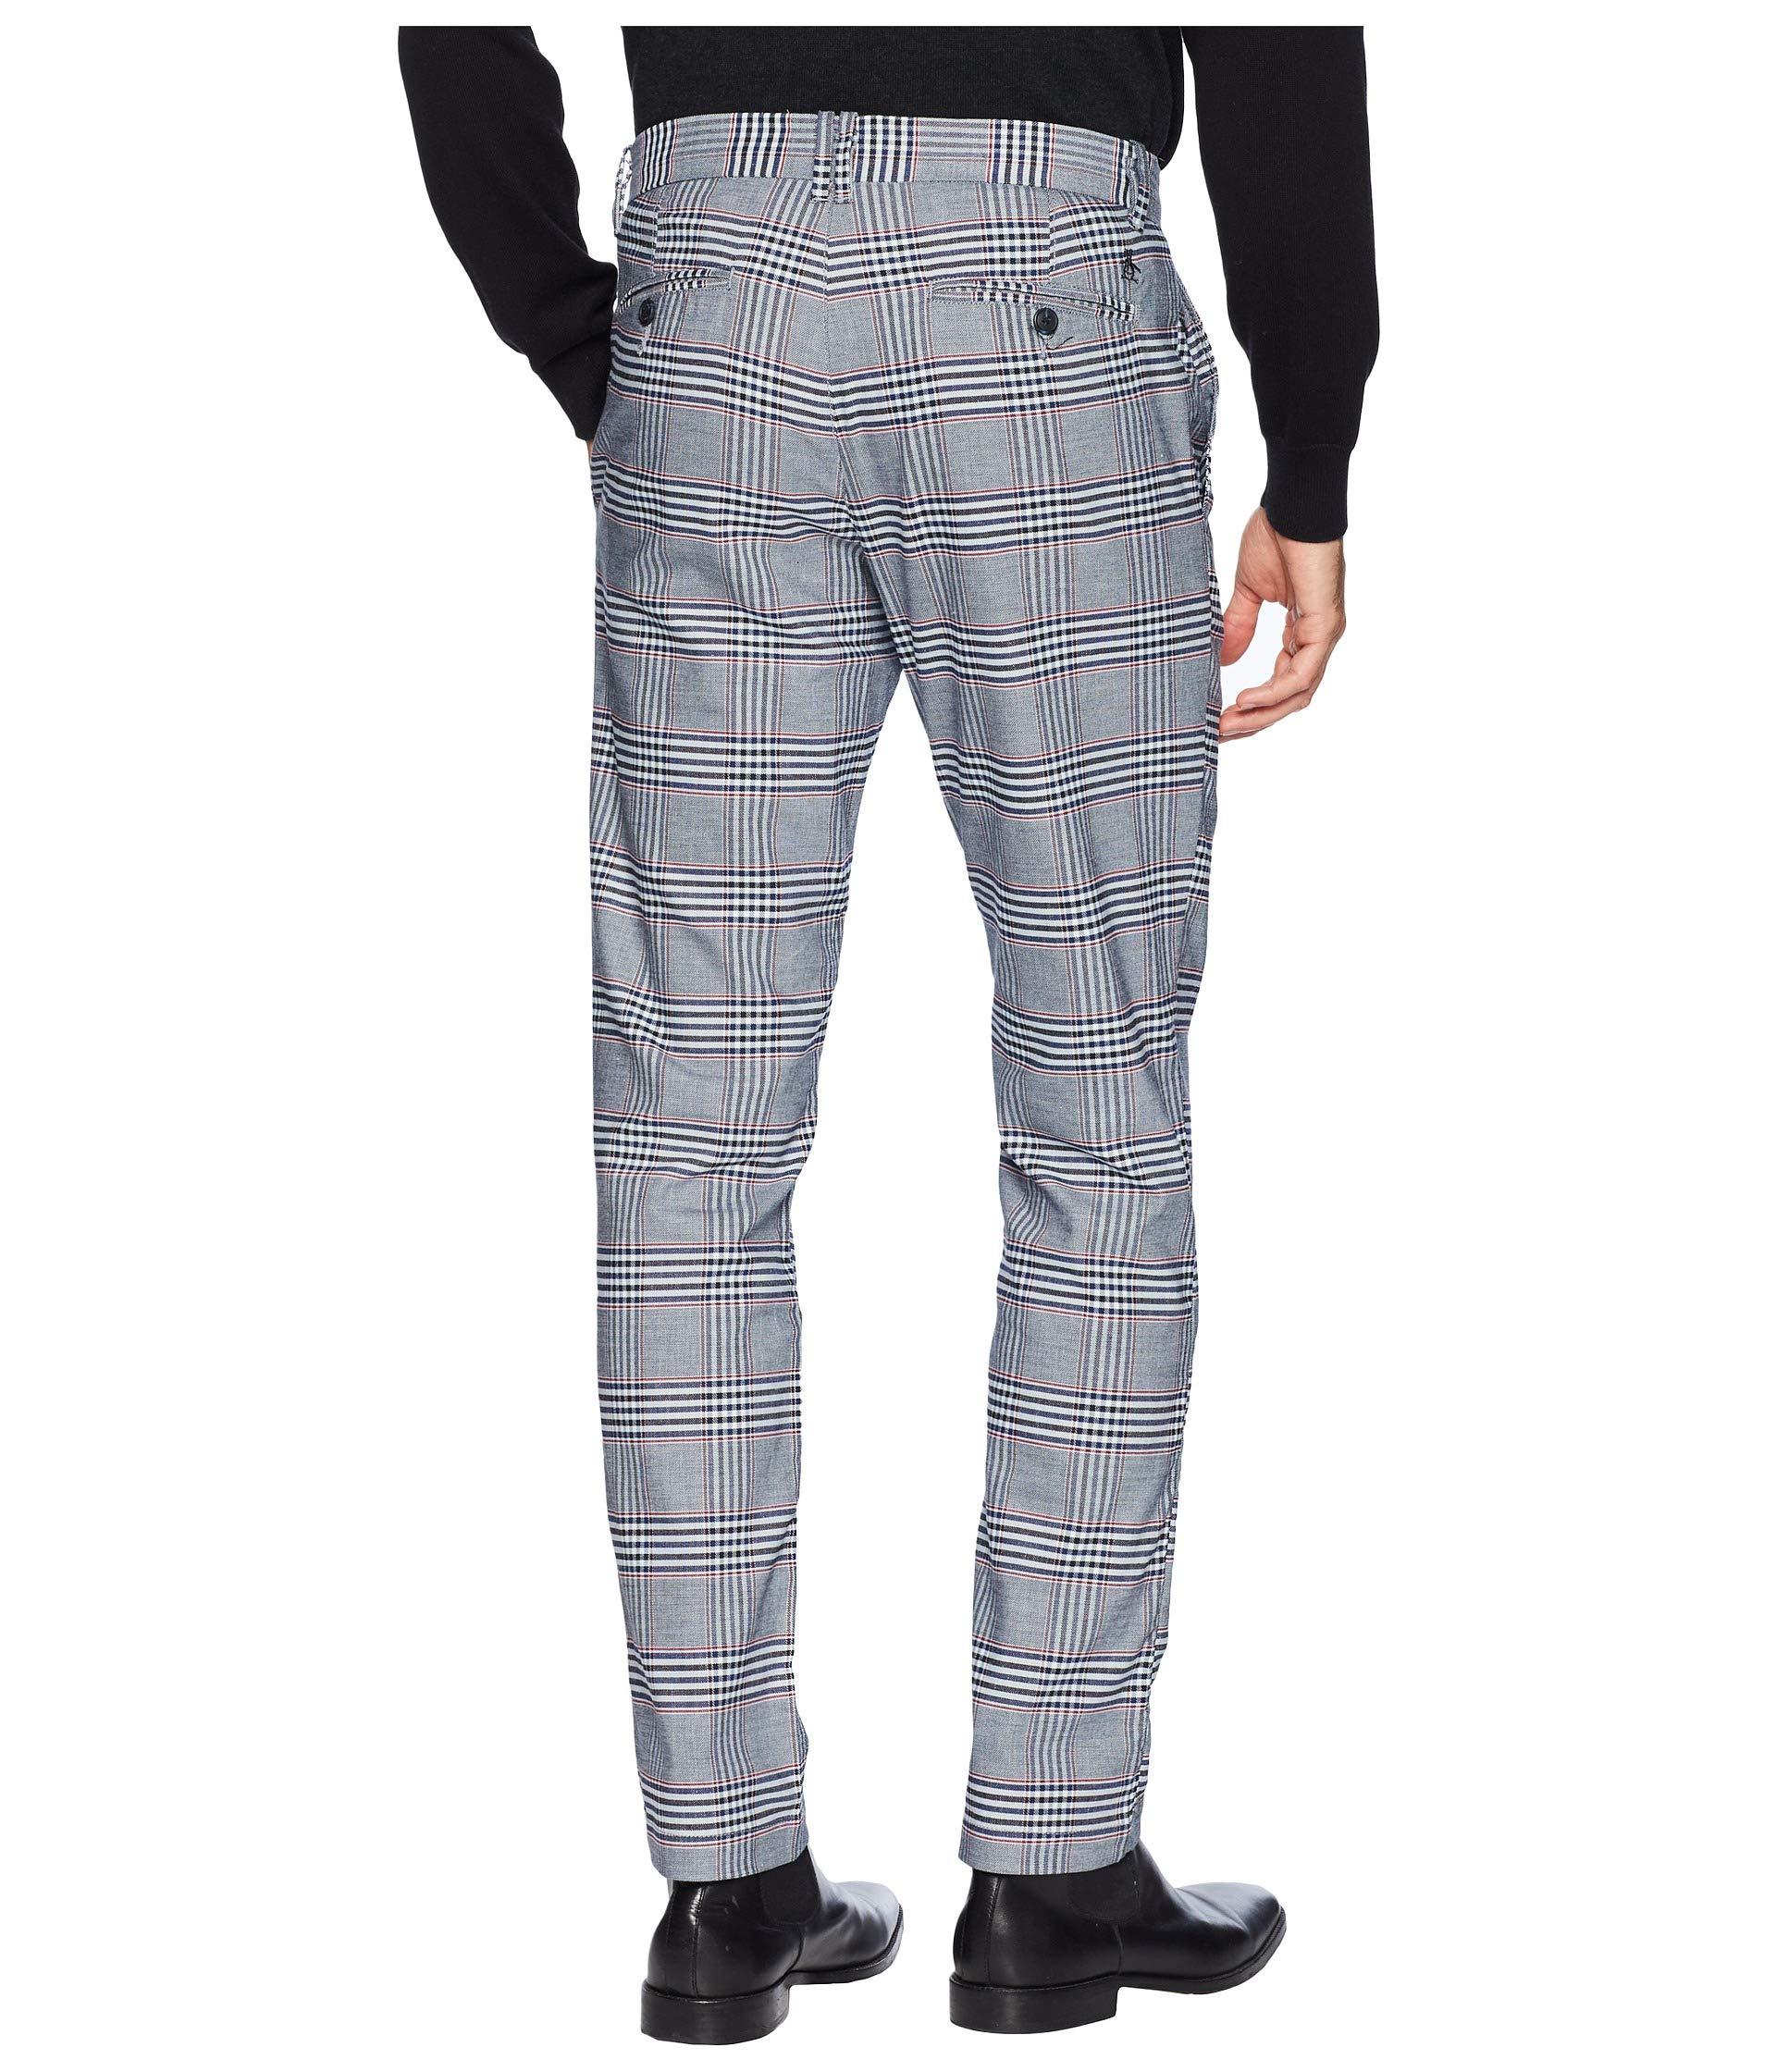 Large Pants Chino Plaid Classic Sapphire Original P55 Penguin Stretch Dark w7xt0a